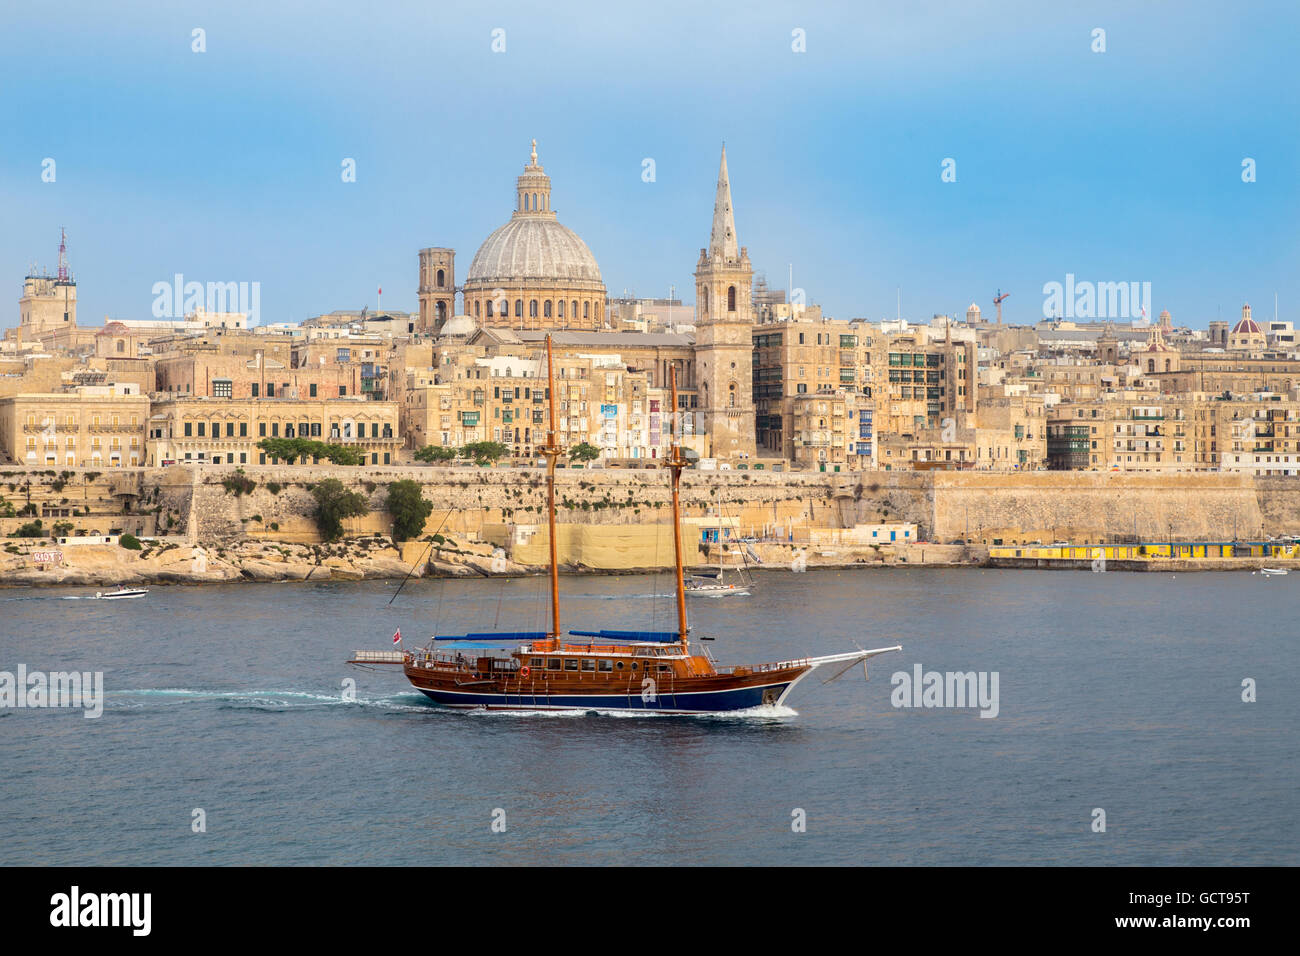 Valletta the capital city seen from Tigne seafront, Malta - Stock Image